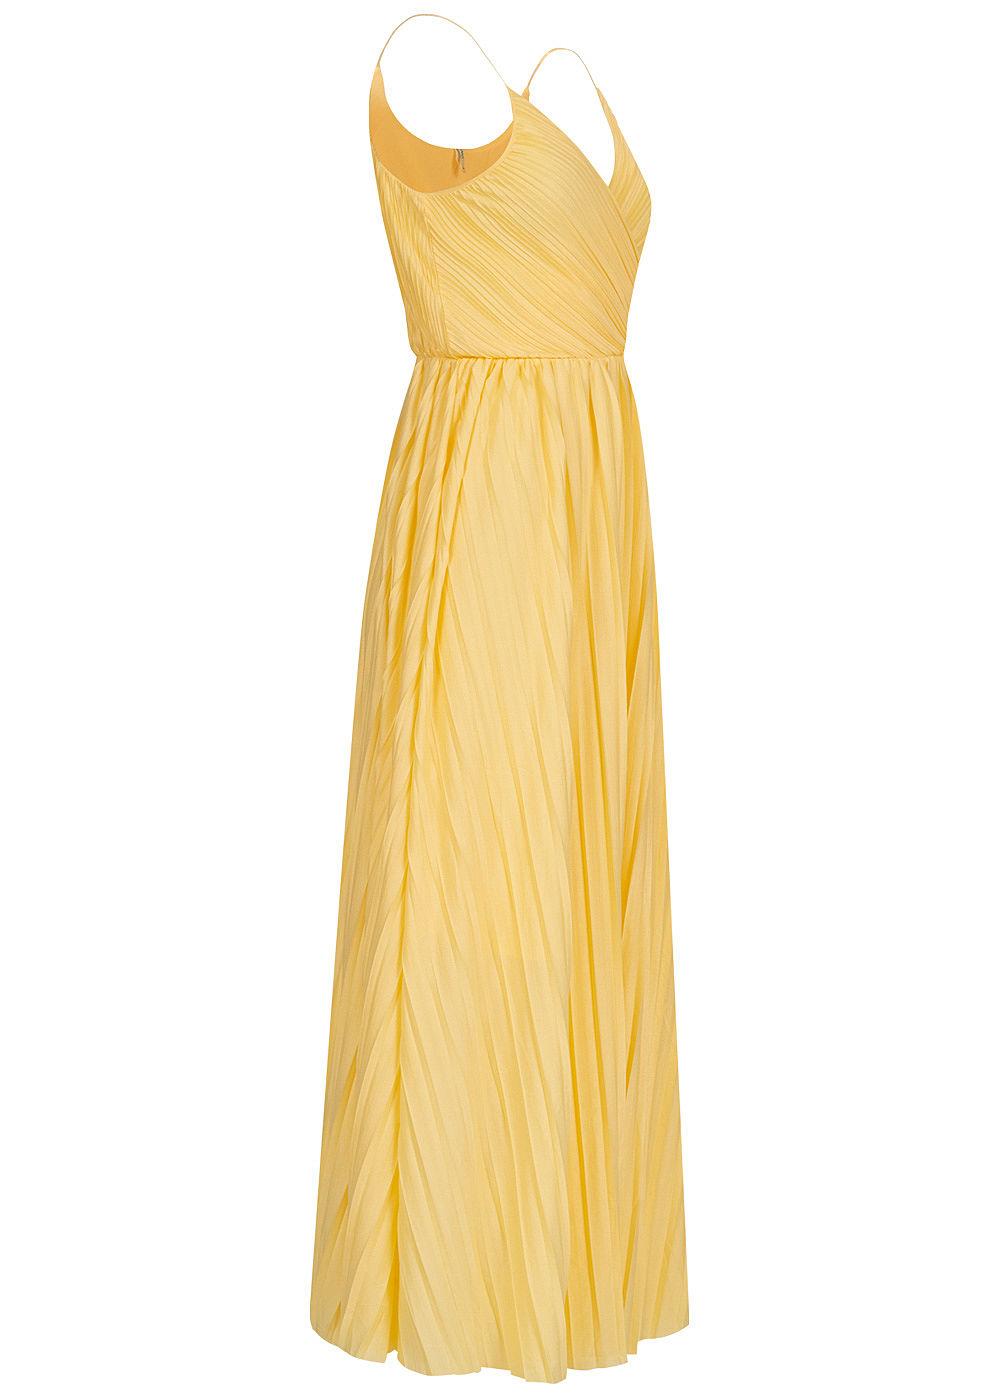 ONLY Damen V-Neck Maxi Kleid Wickeloptik mit Falten 11-lagig dusky citron  gelb